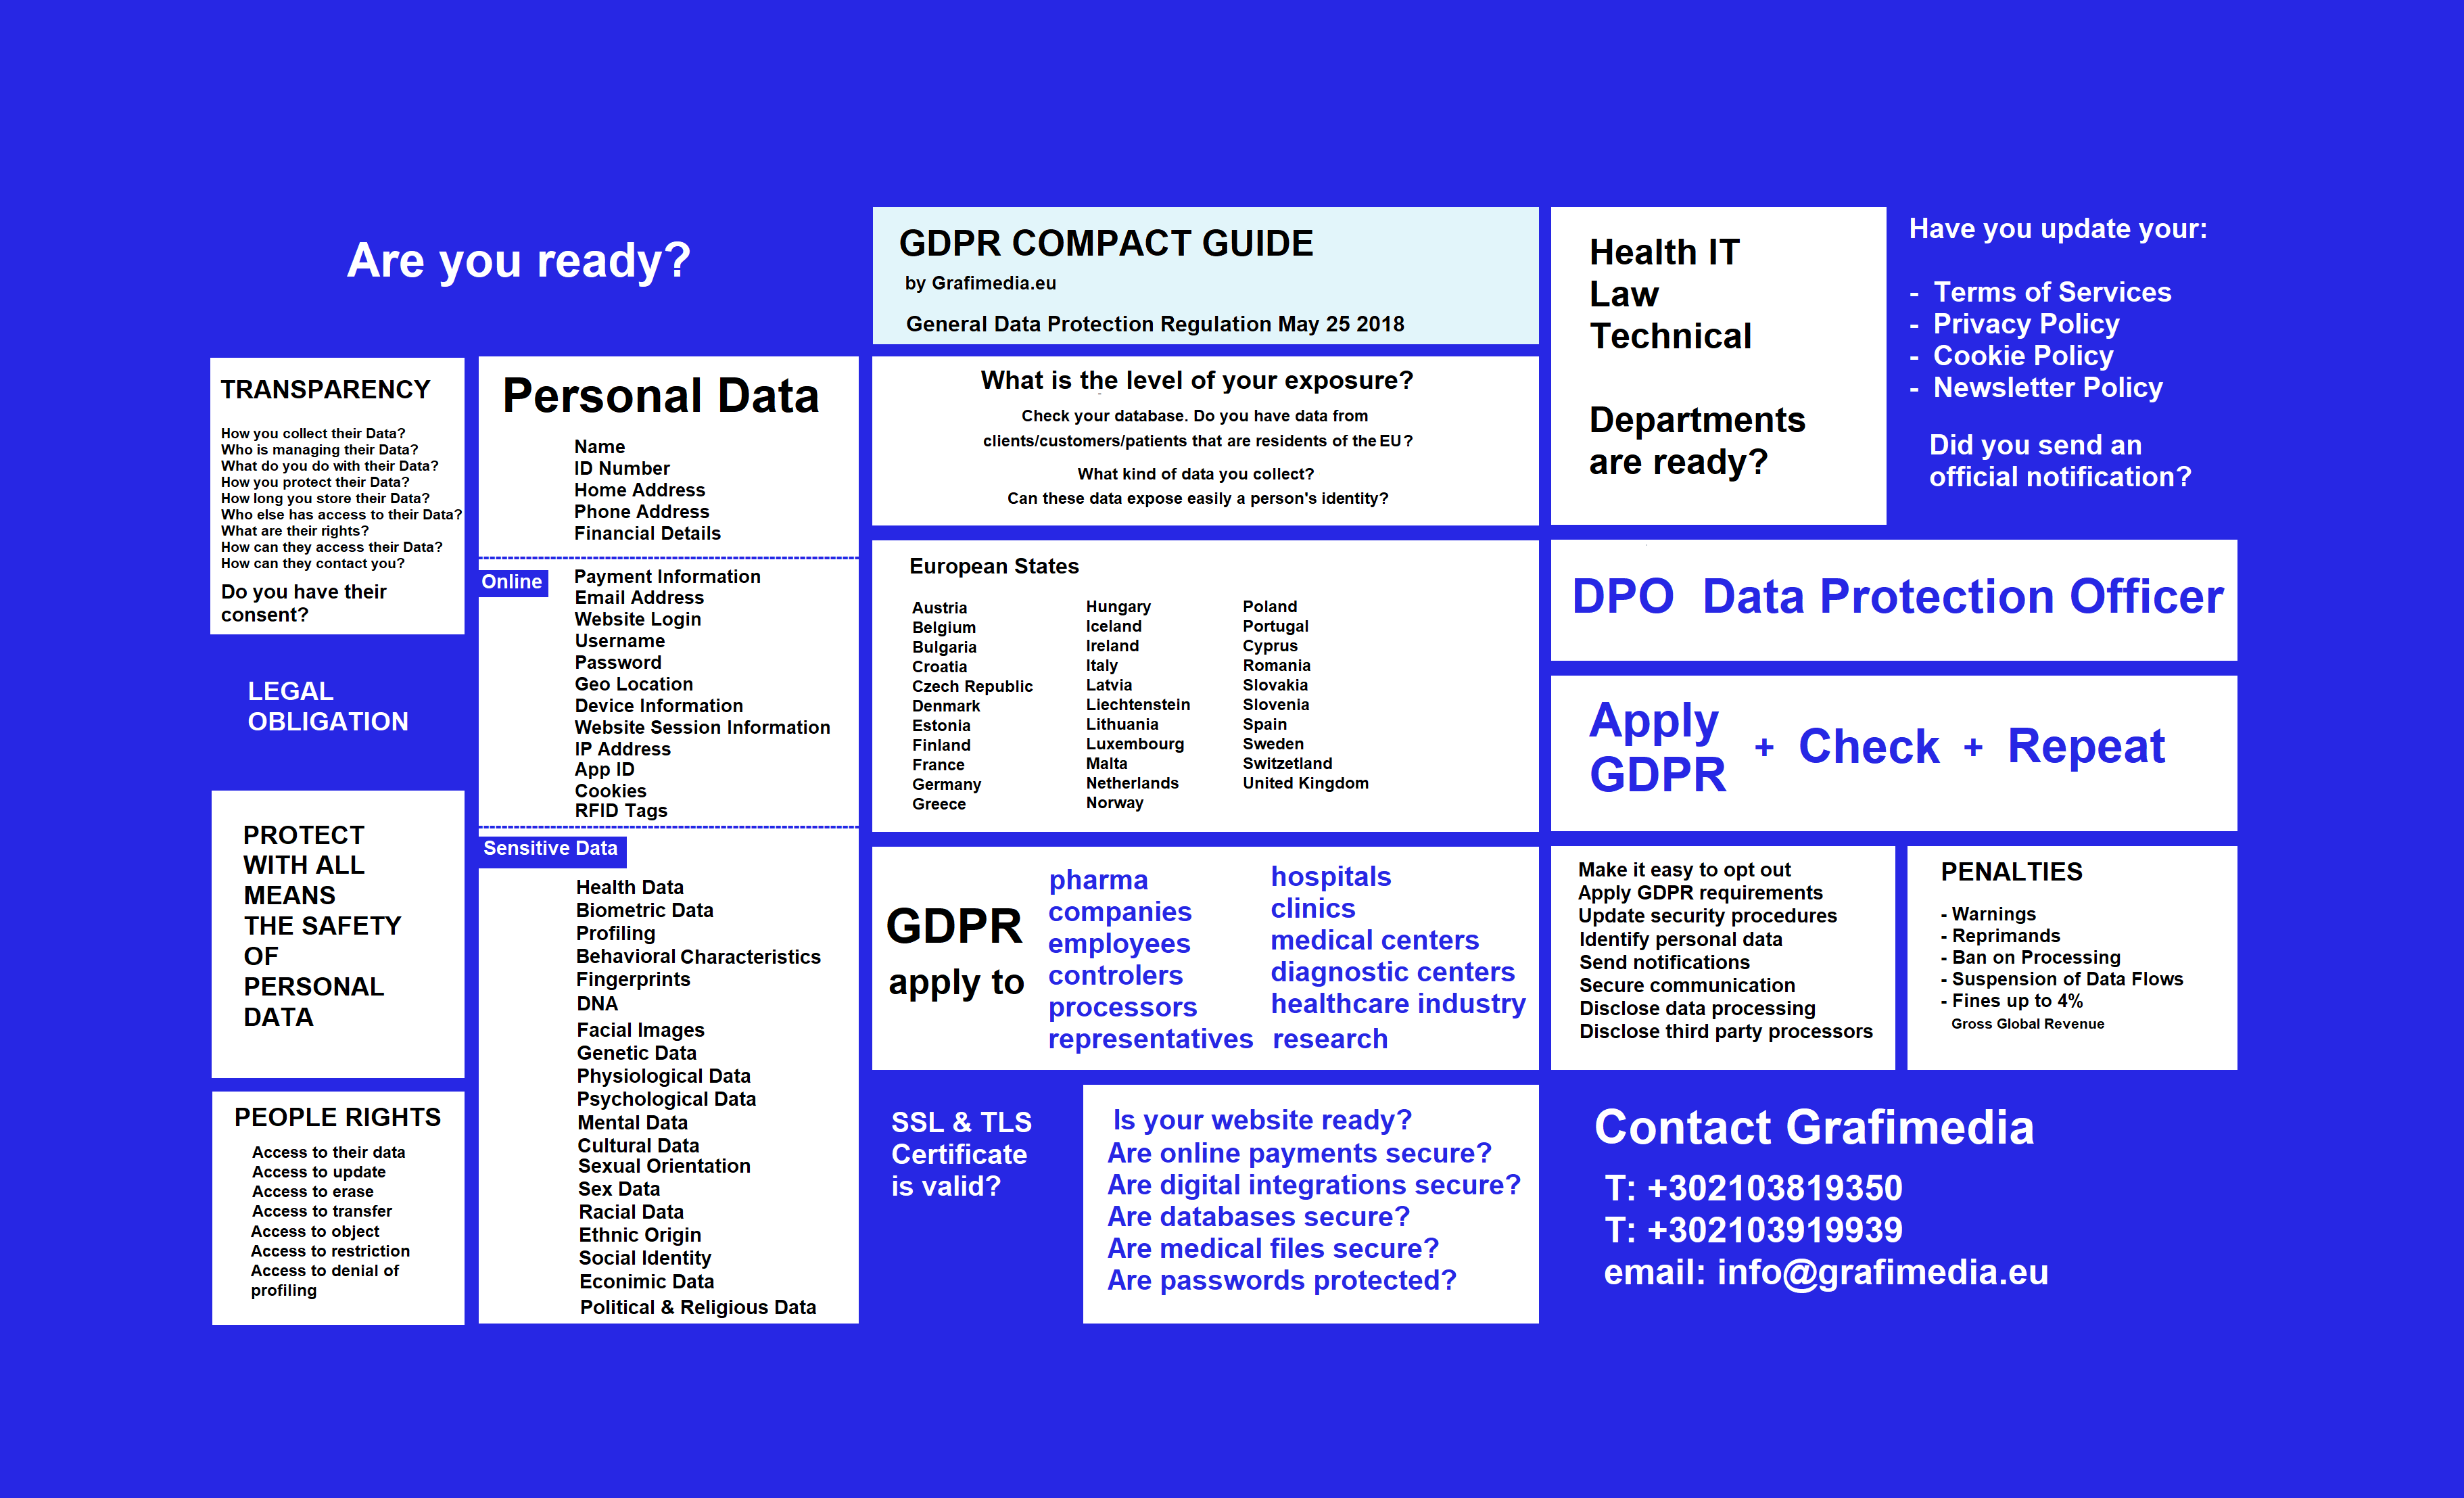 GDPR Compact Guide by Grafimedia Health IT